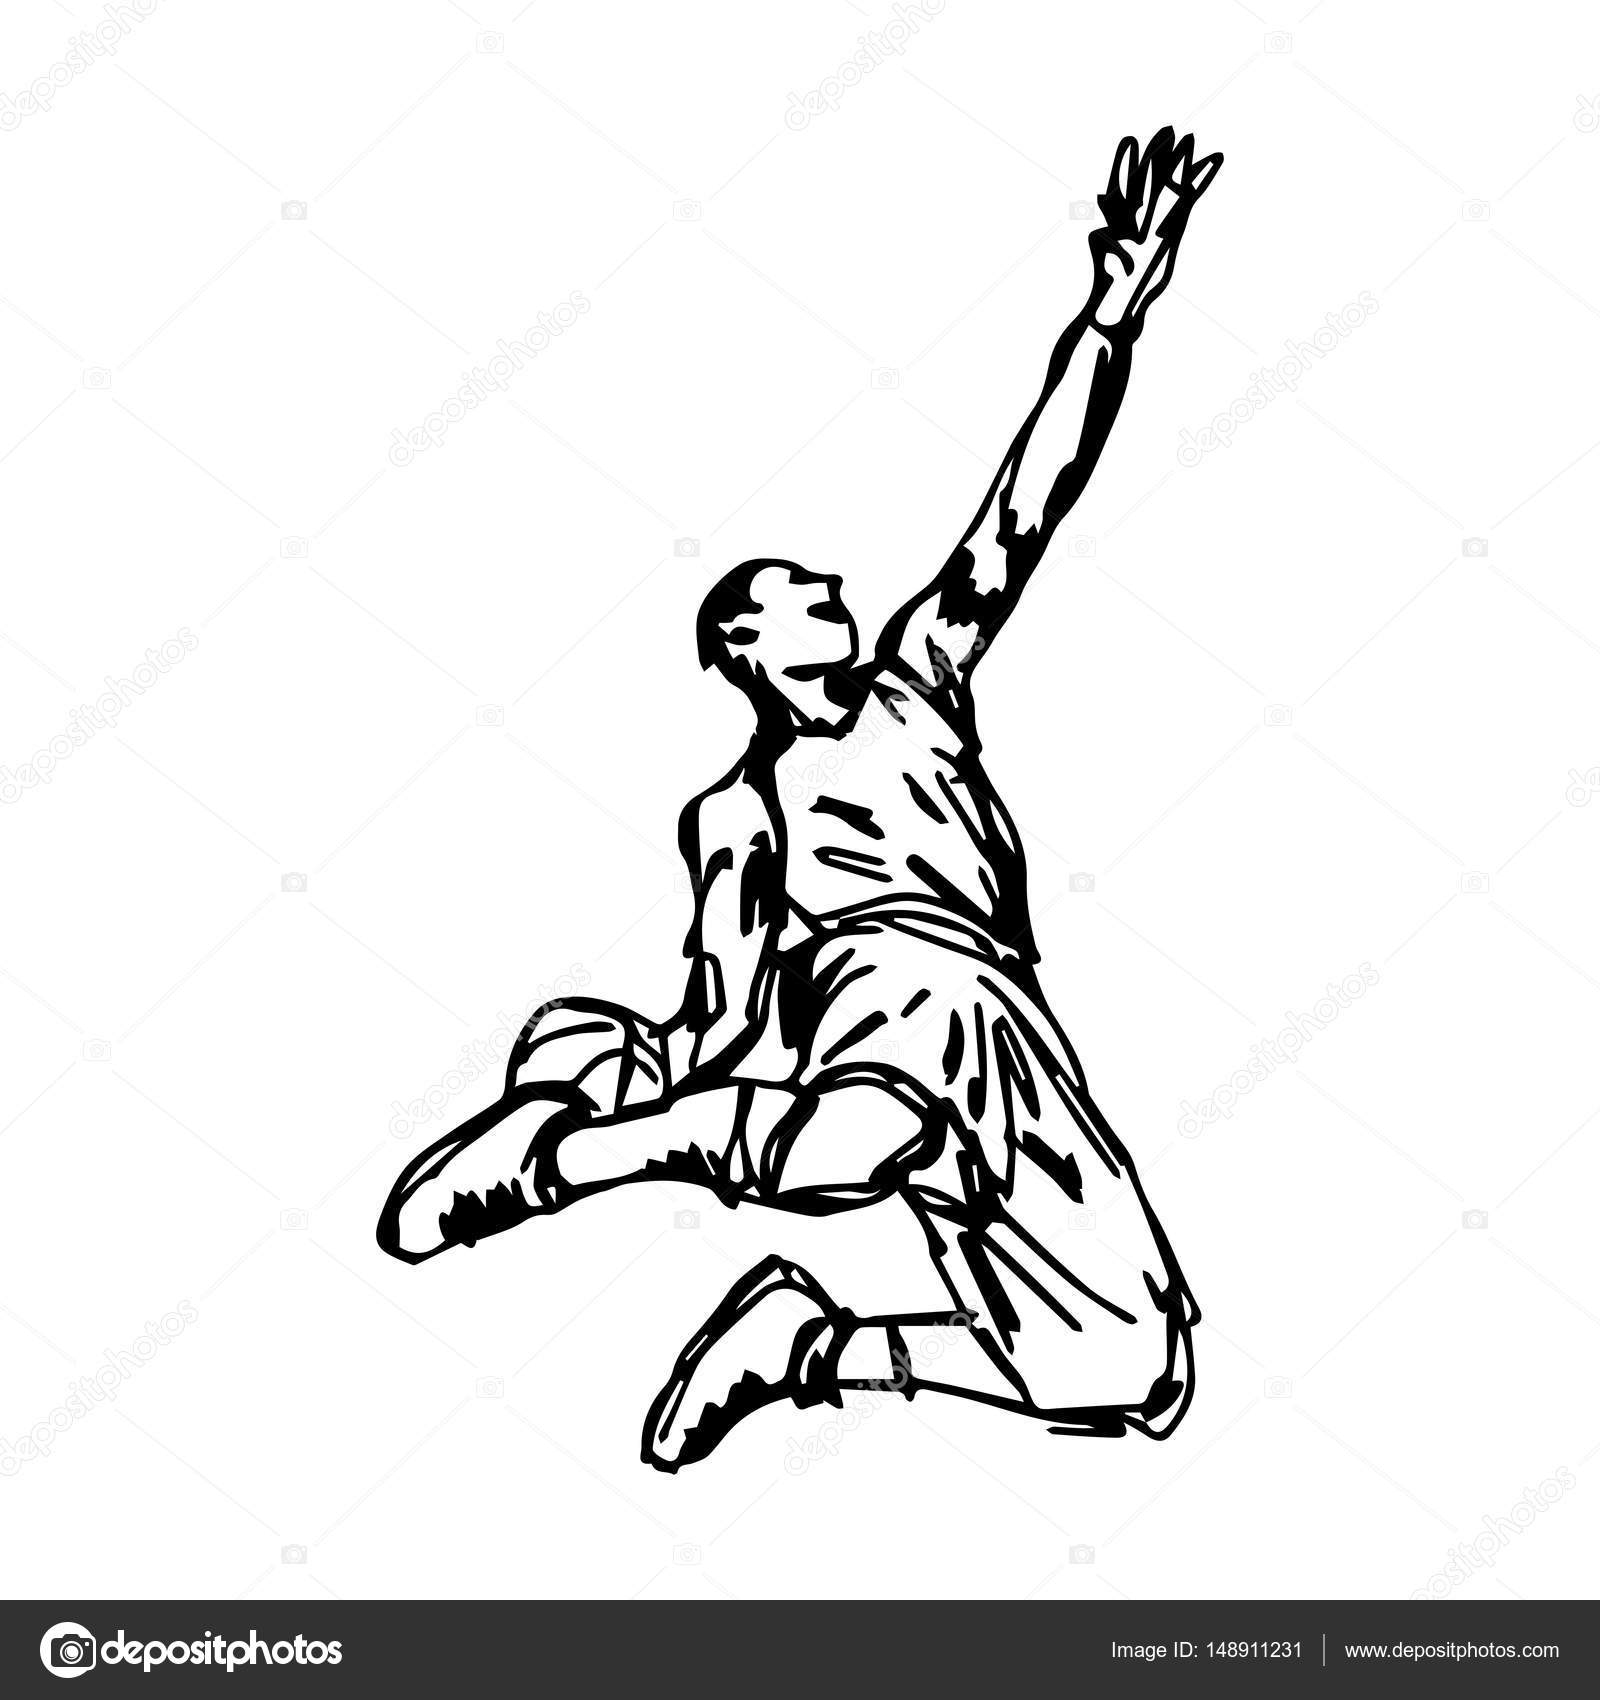 1600x1700 Basketball Player Making Slam Dunk